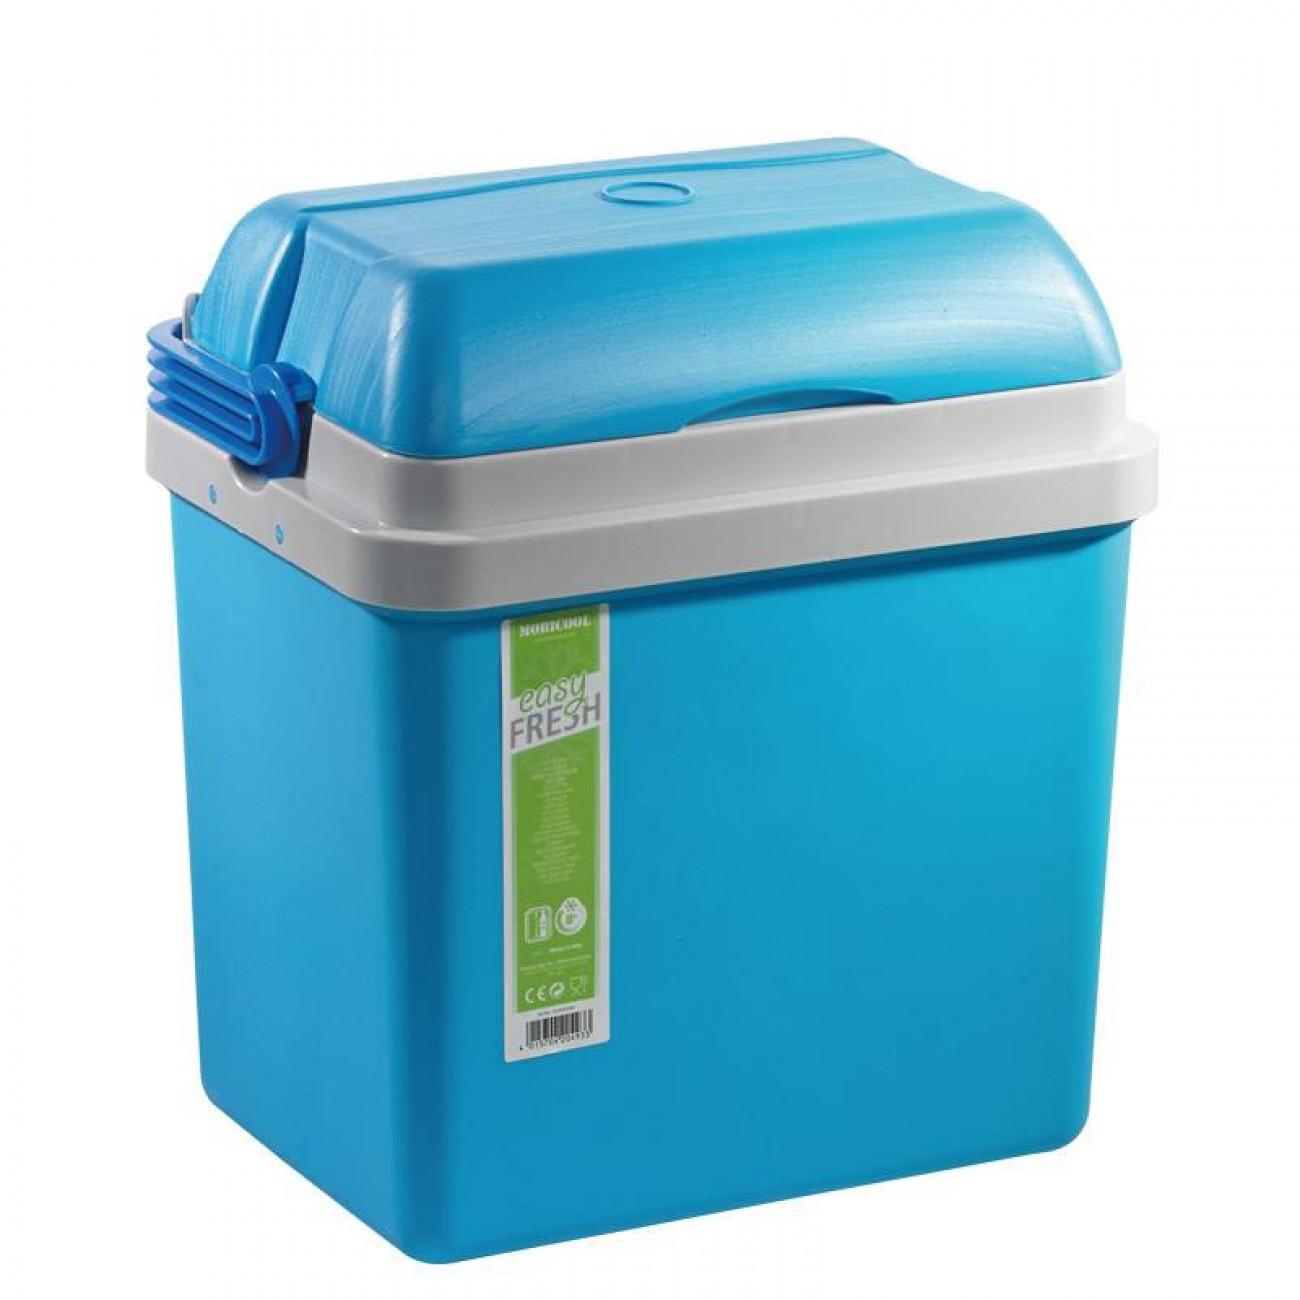 Хладилна чанта MOBICOOL PB25, 25 литра в Хладилни чанти - Mobicool | Alleop